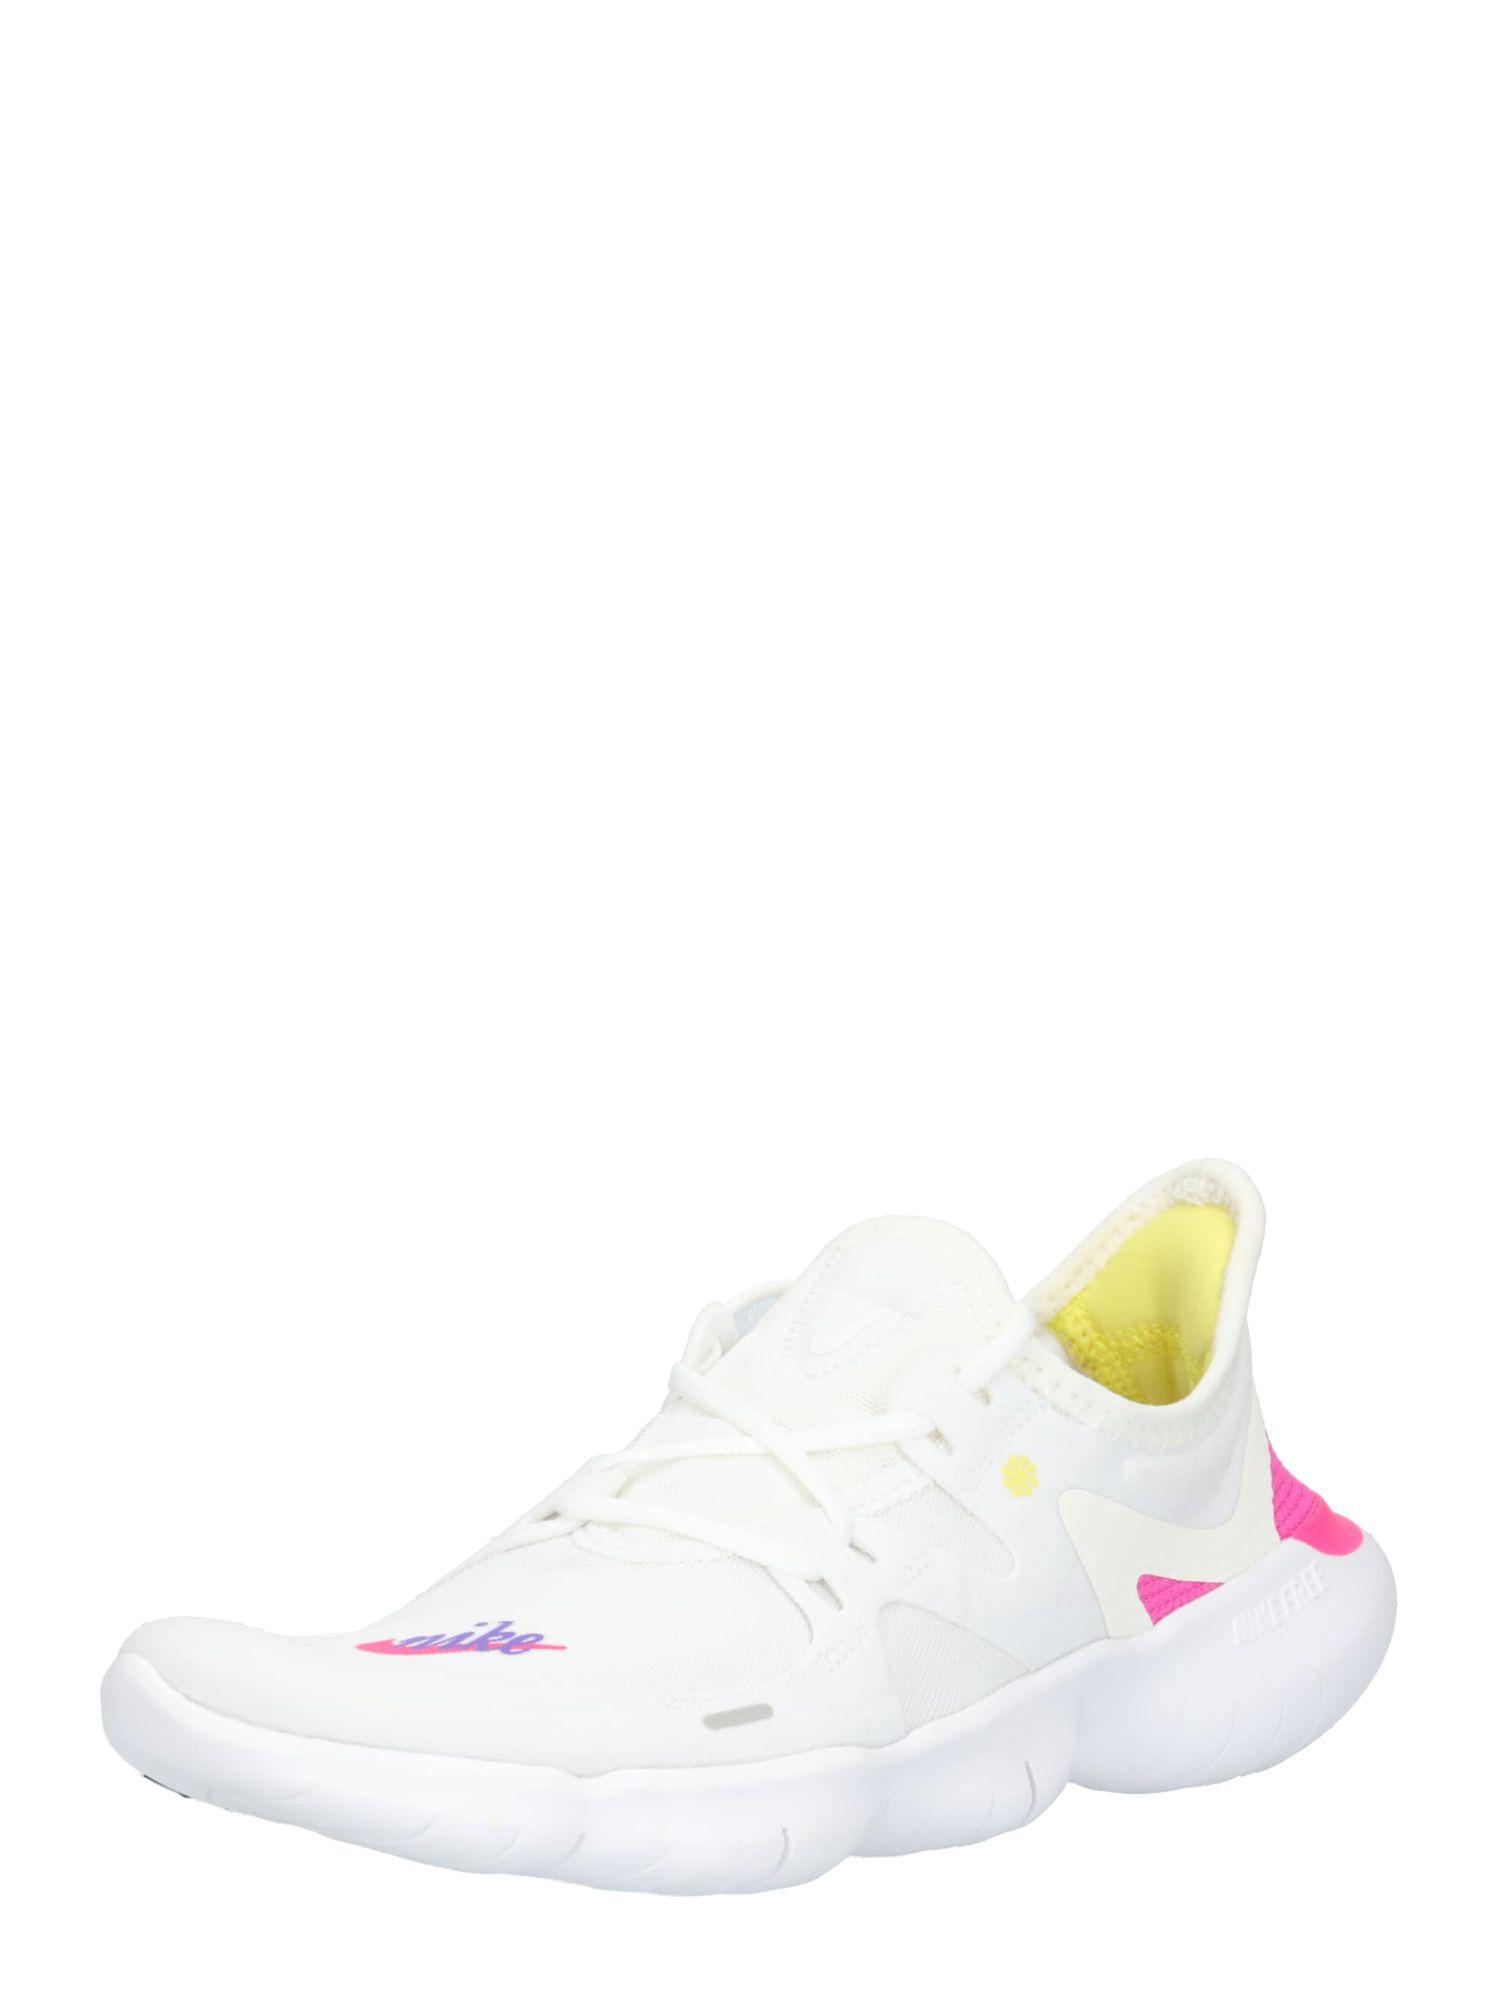 Sport-Schuh ´NIKE FREE RN 5.0 JDI´